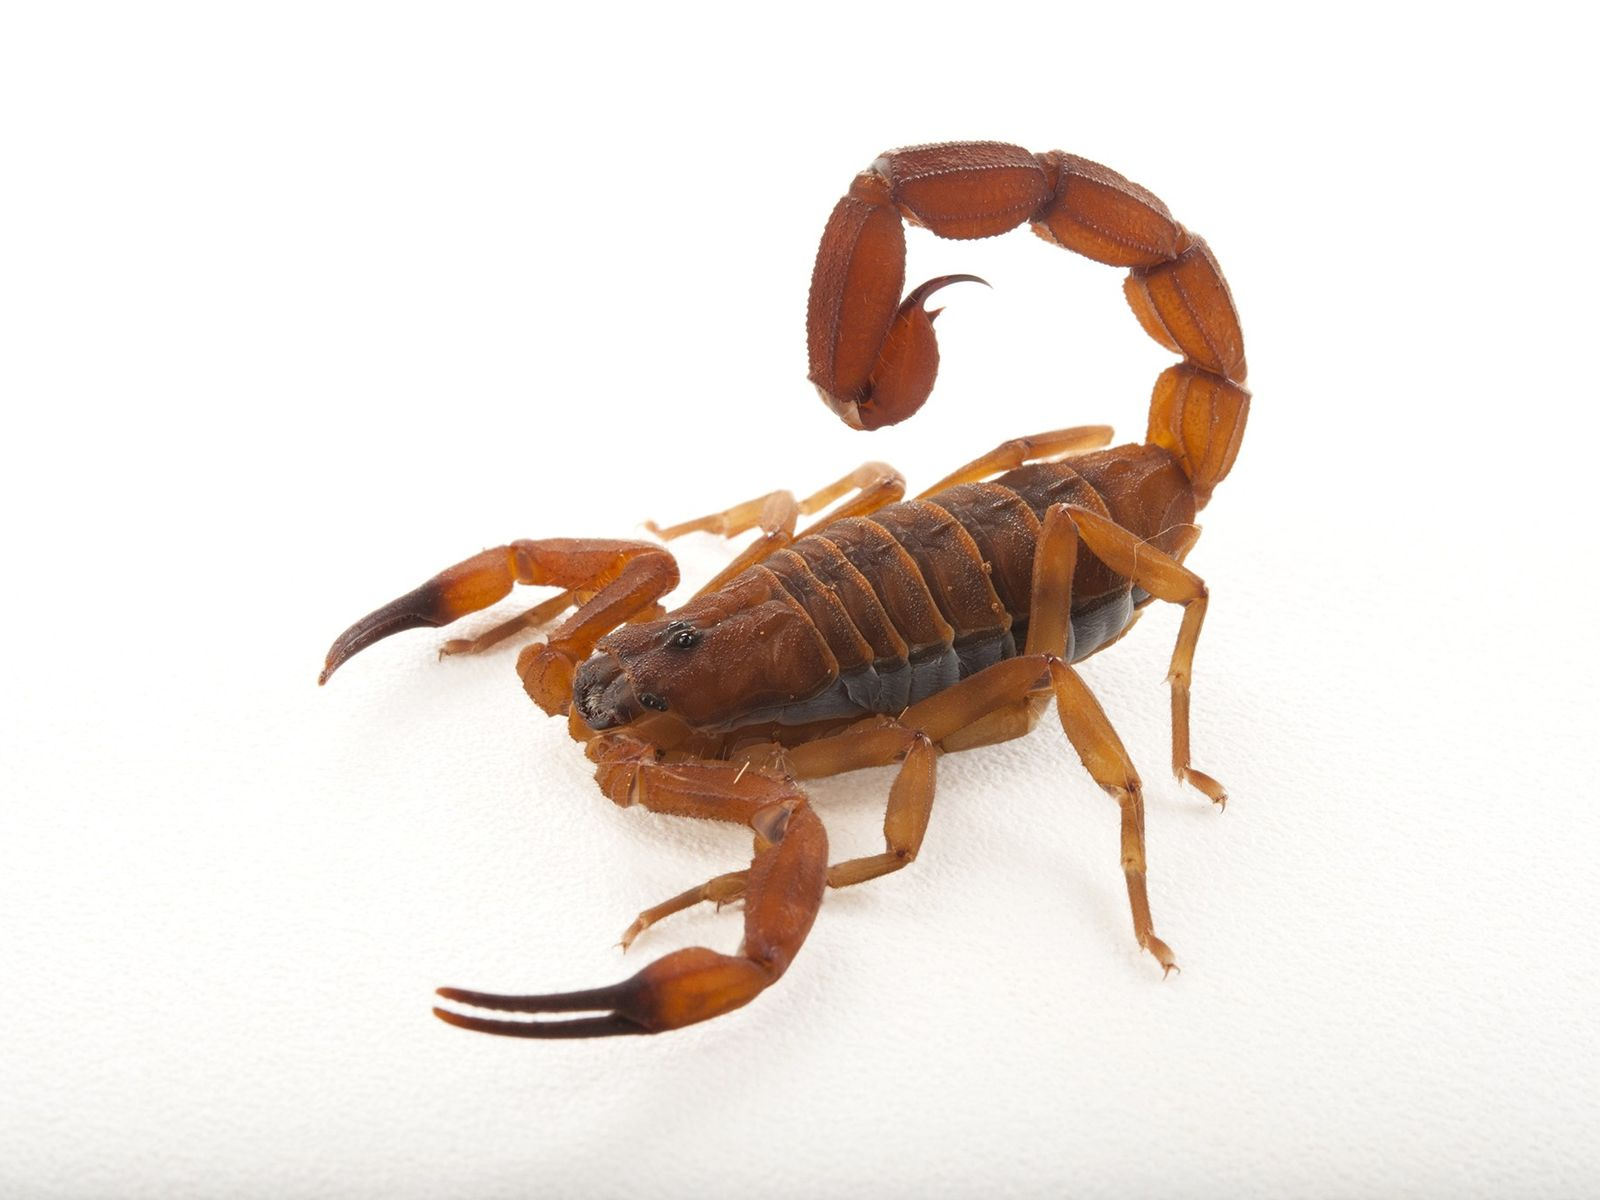 Escorpión Babycurus jacksoni